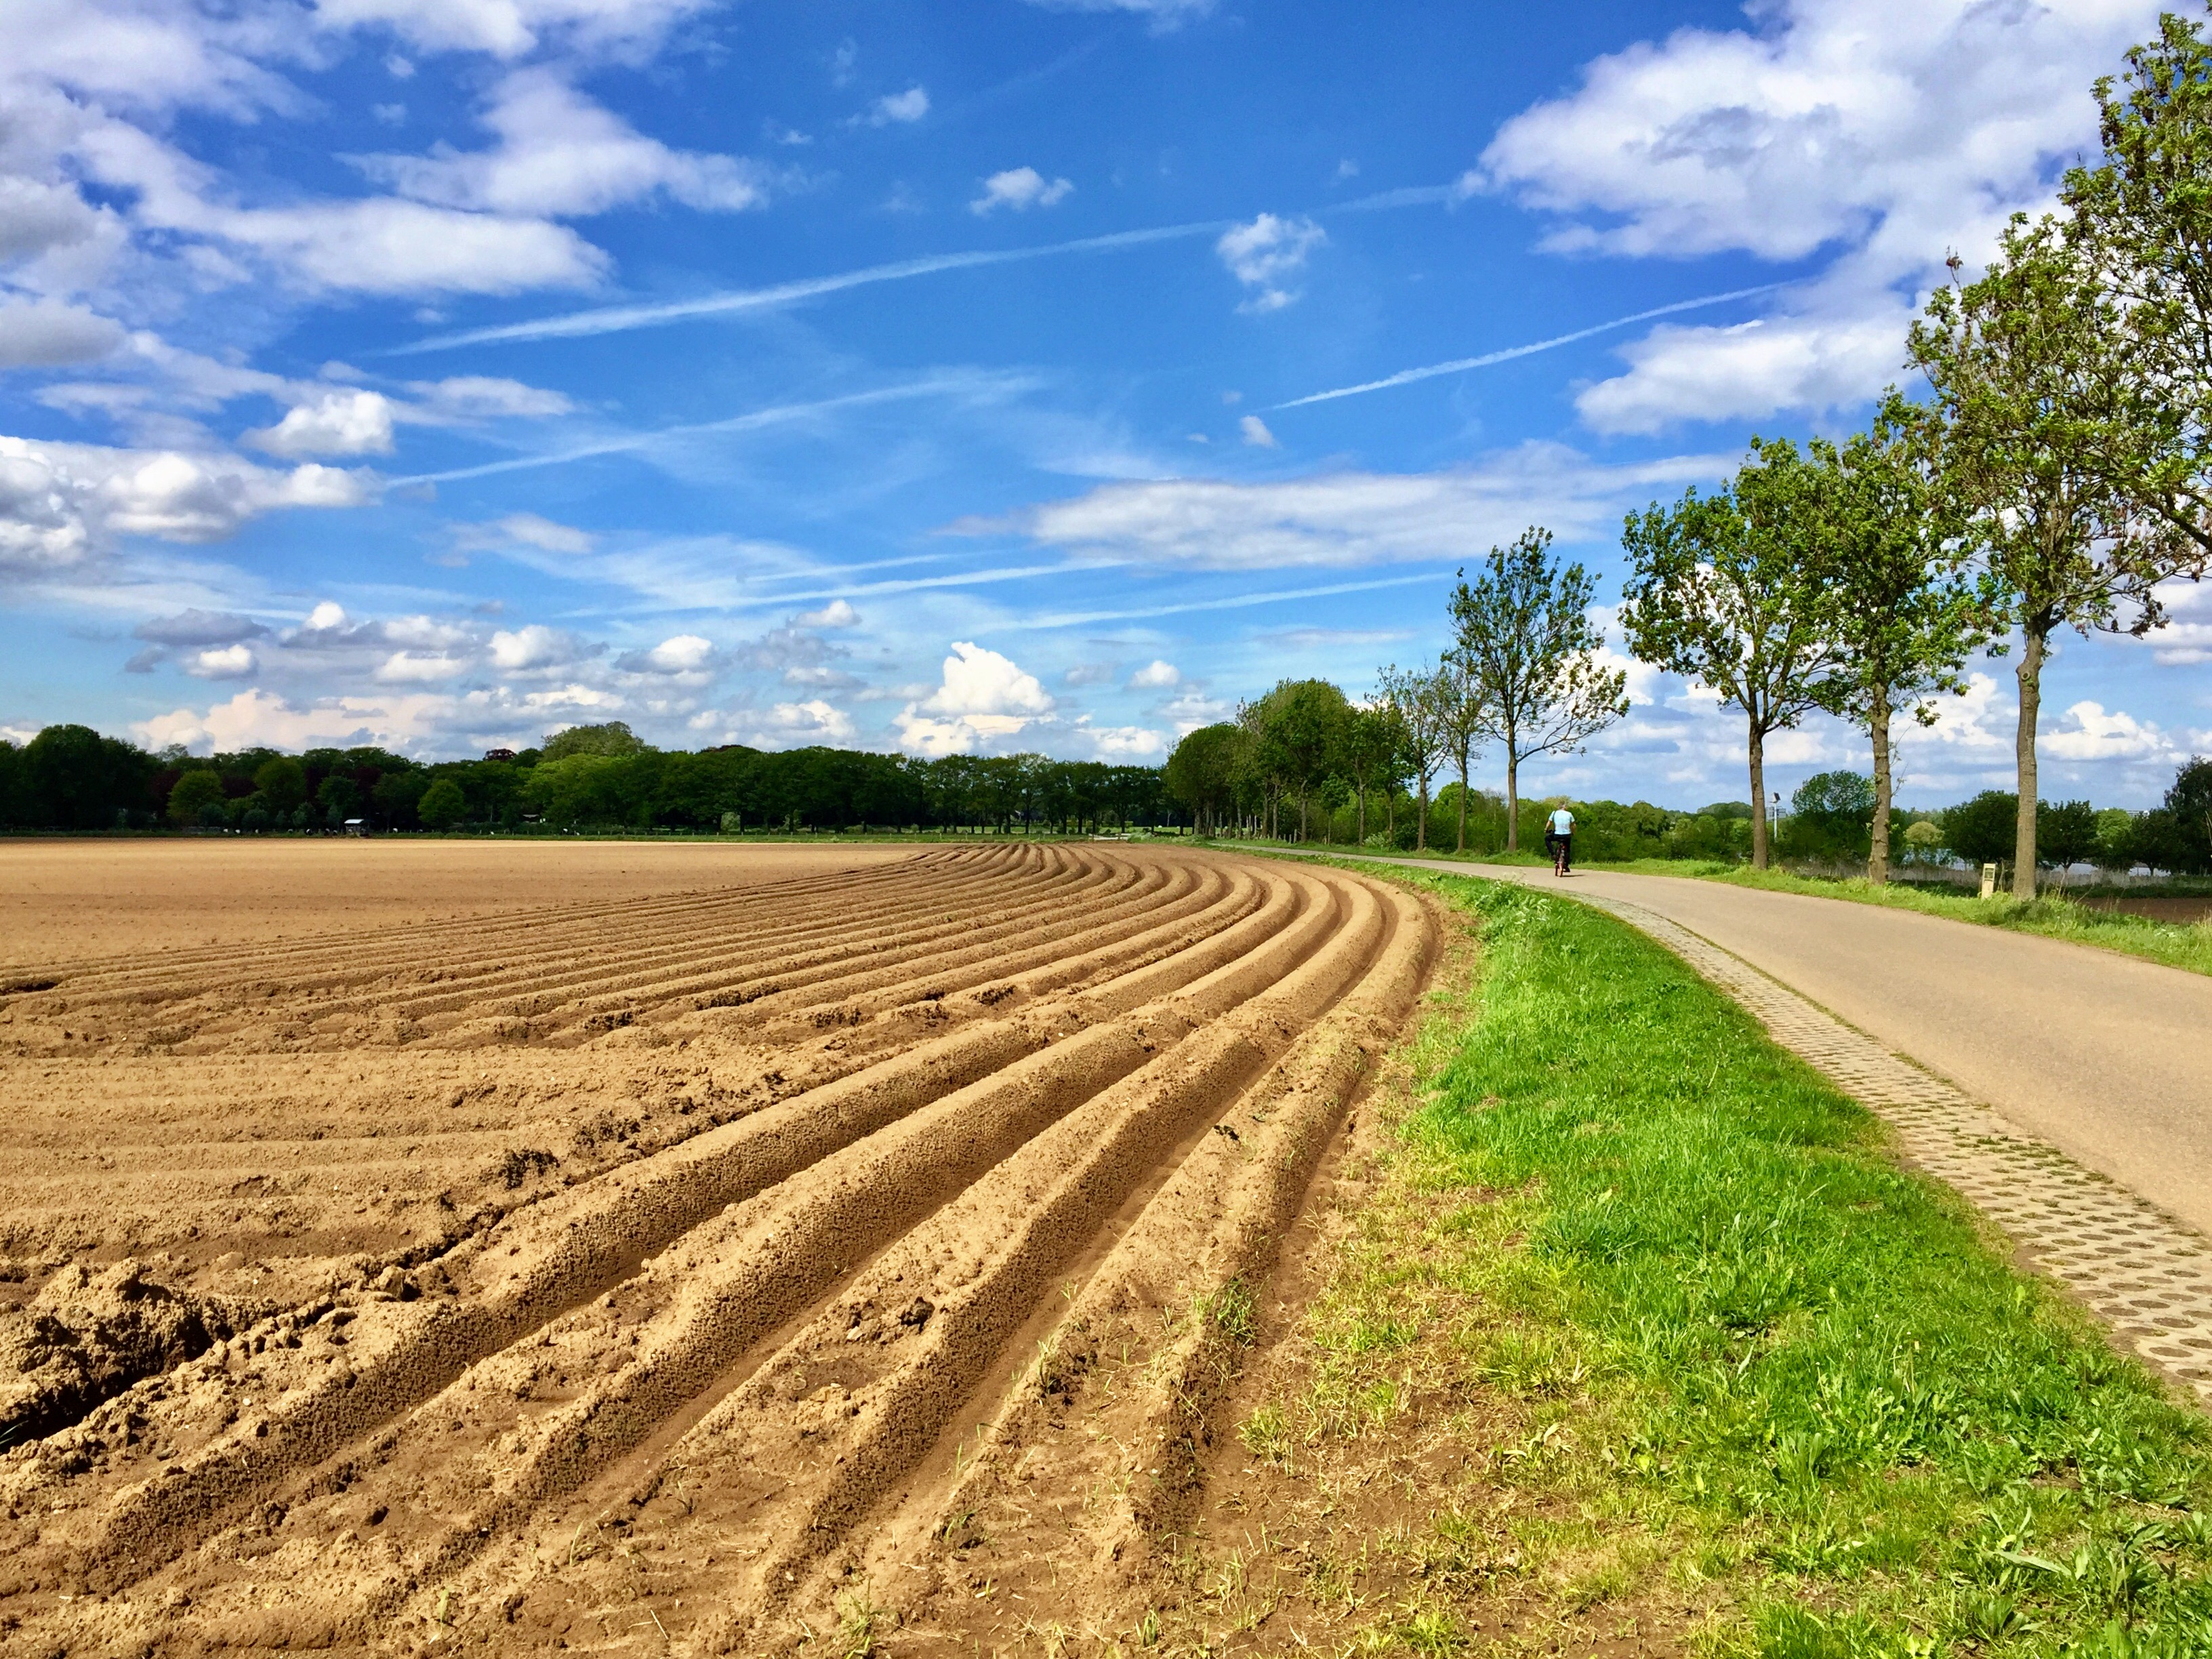 Aspergevelden in Noord-Limburg. Foto Sybylle Kroon